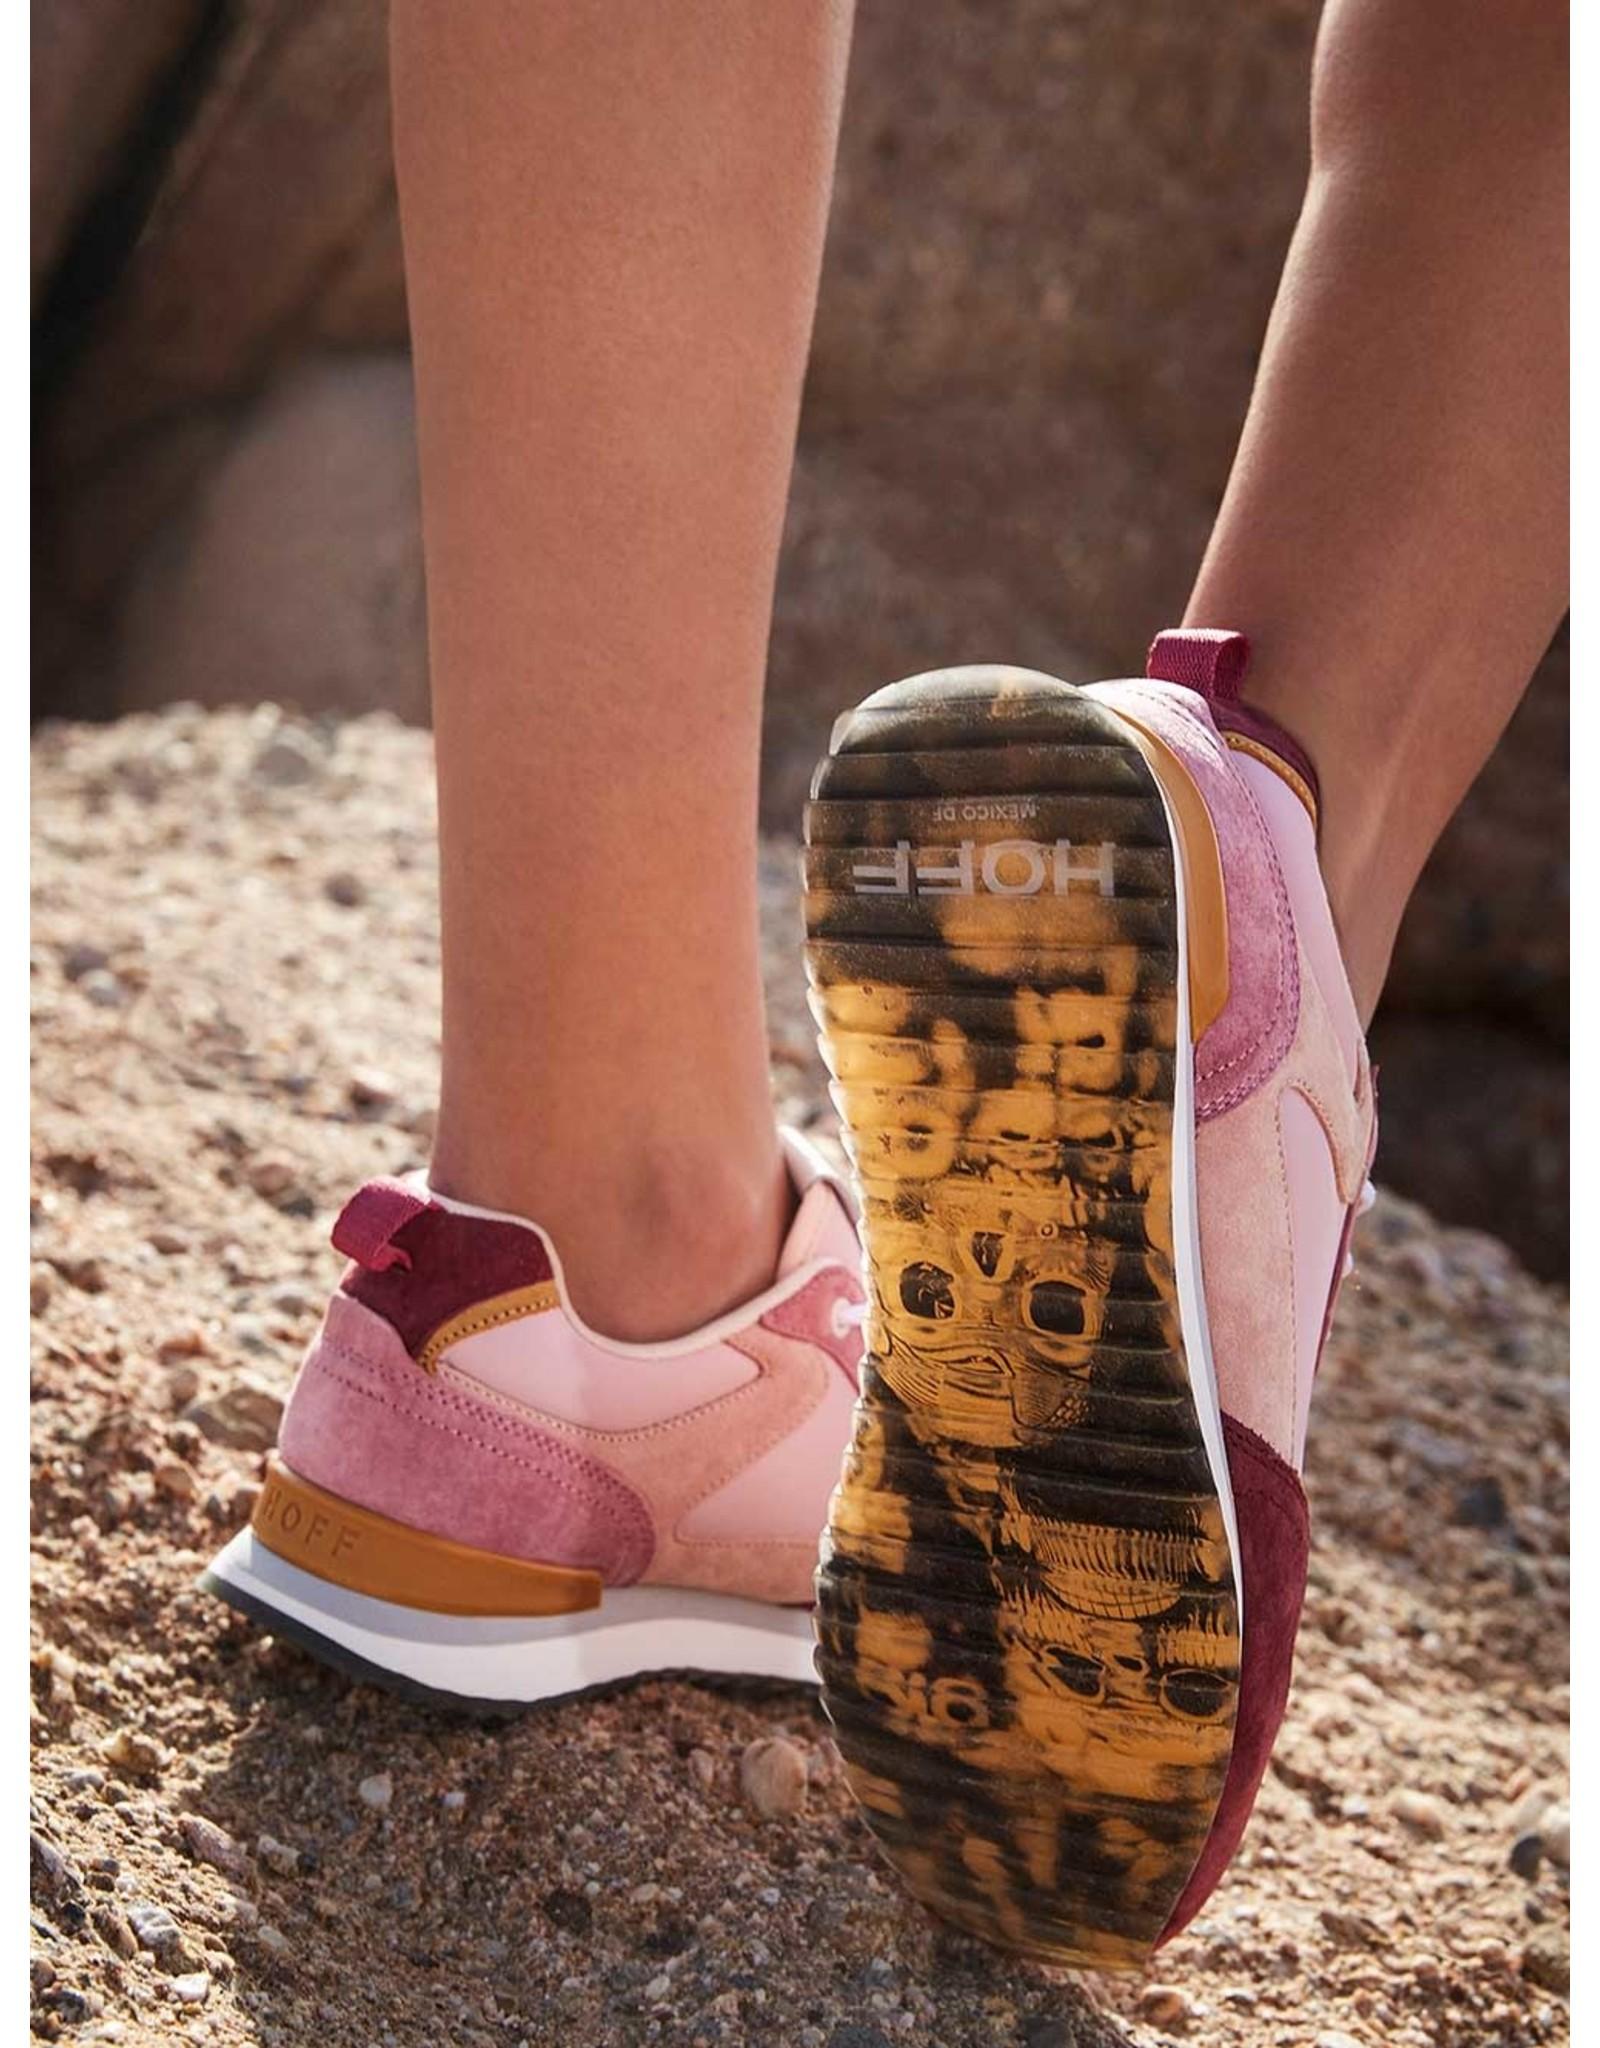 HOFF Mexico Sneaker